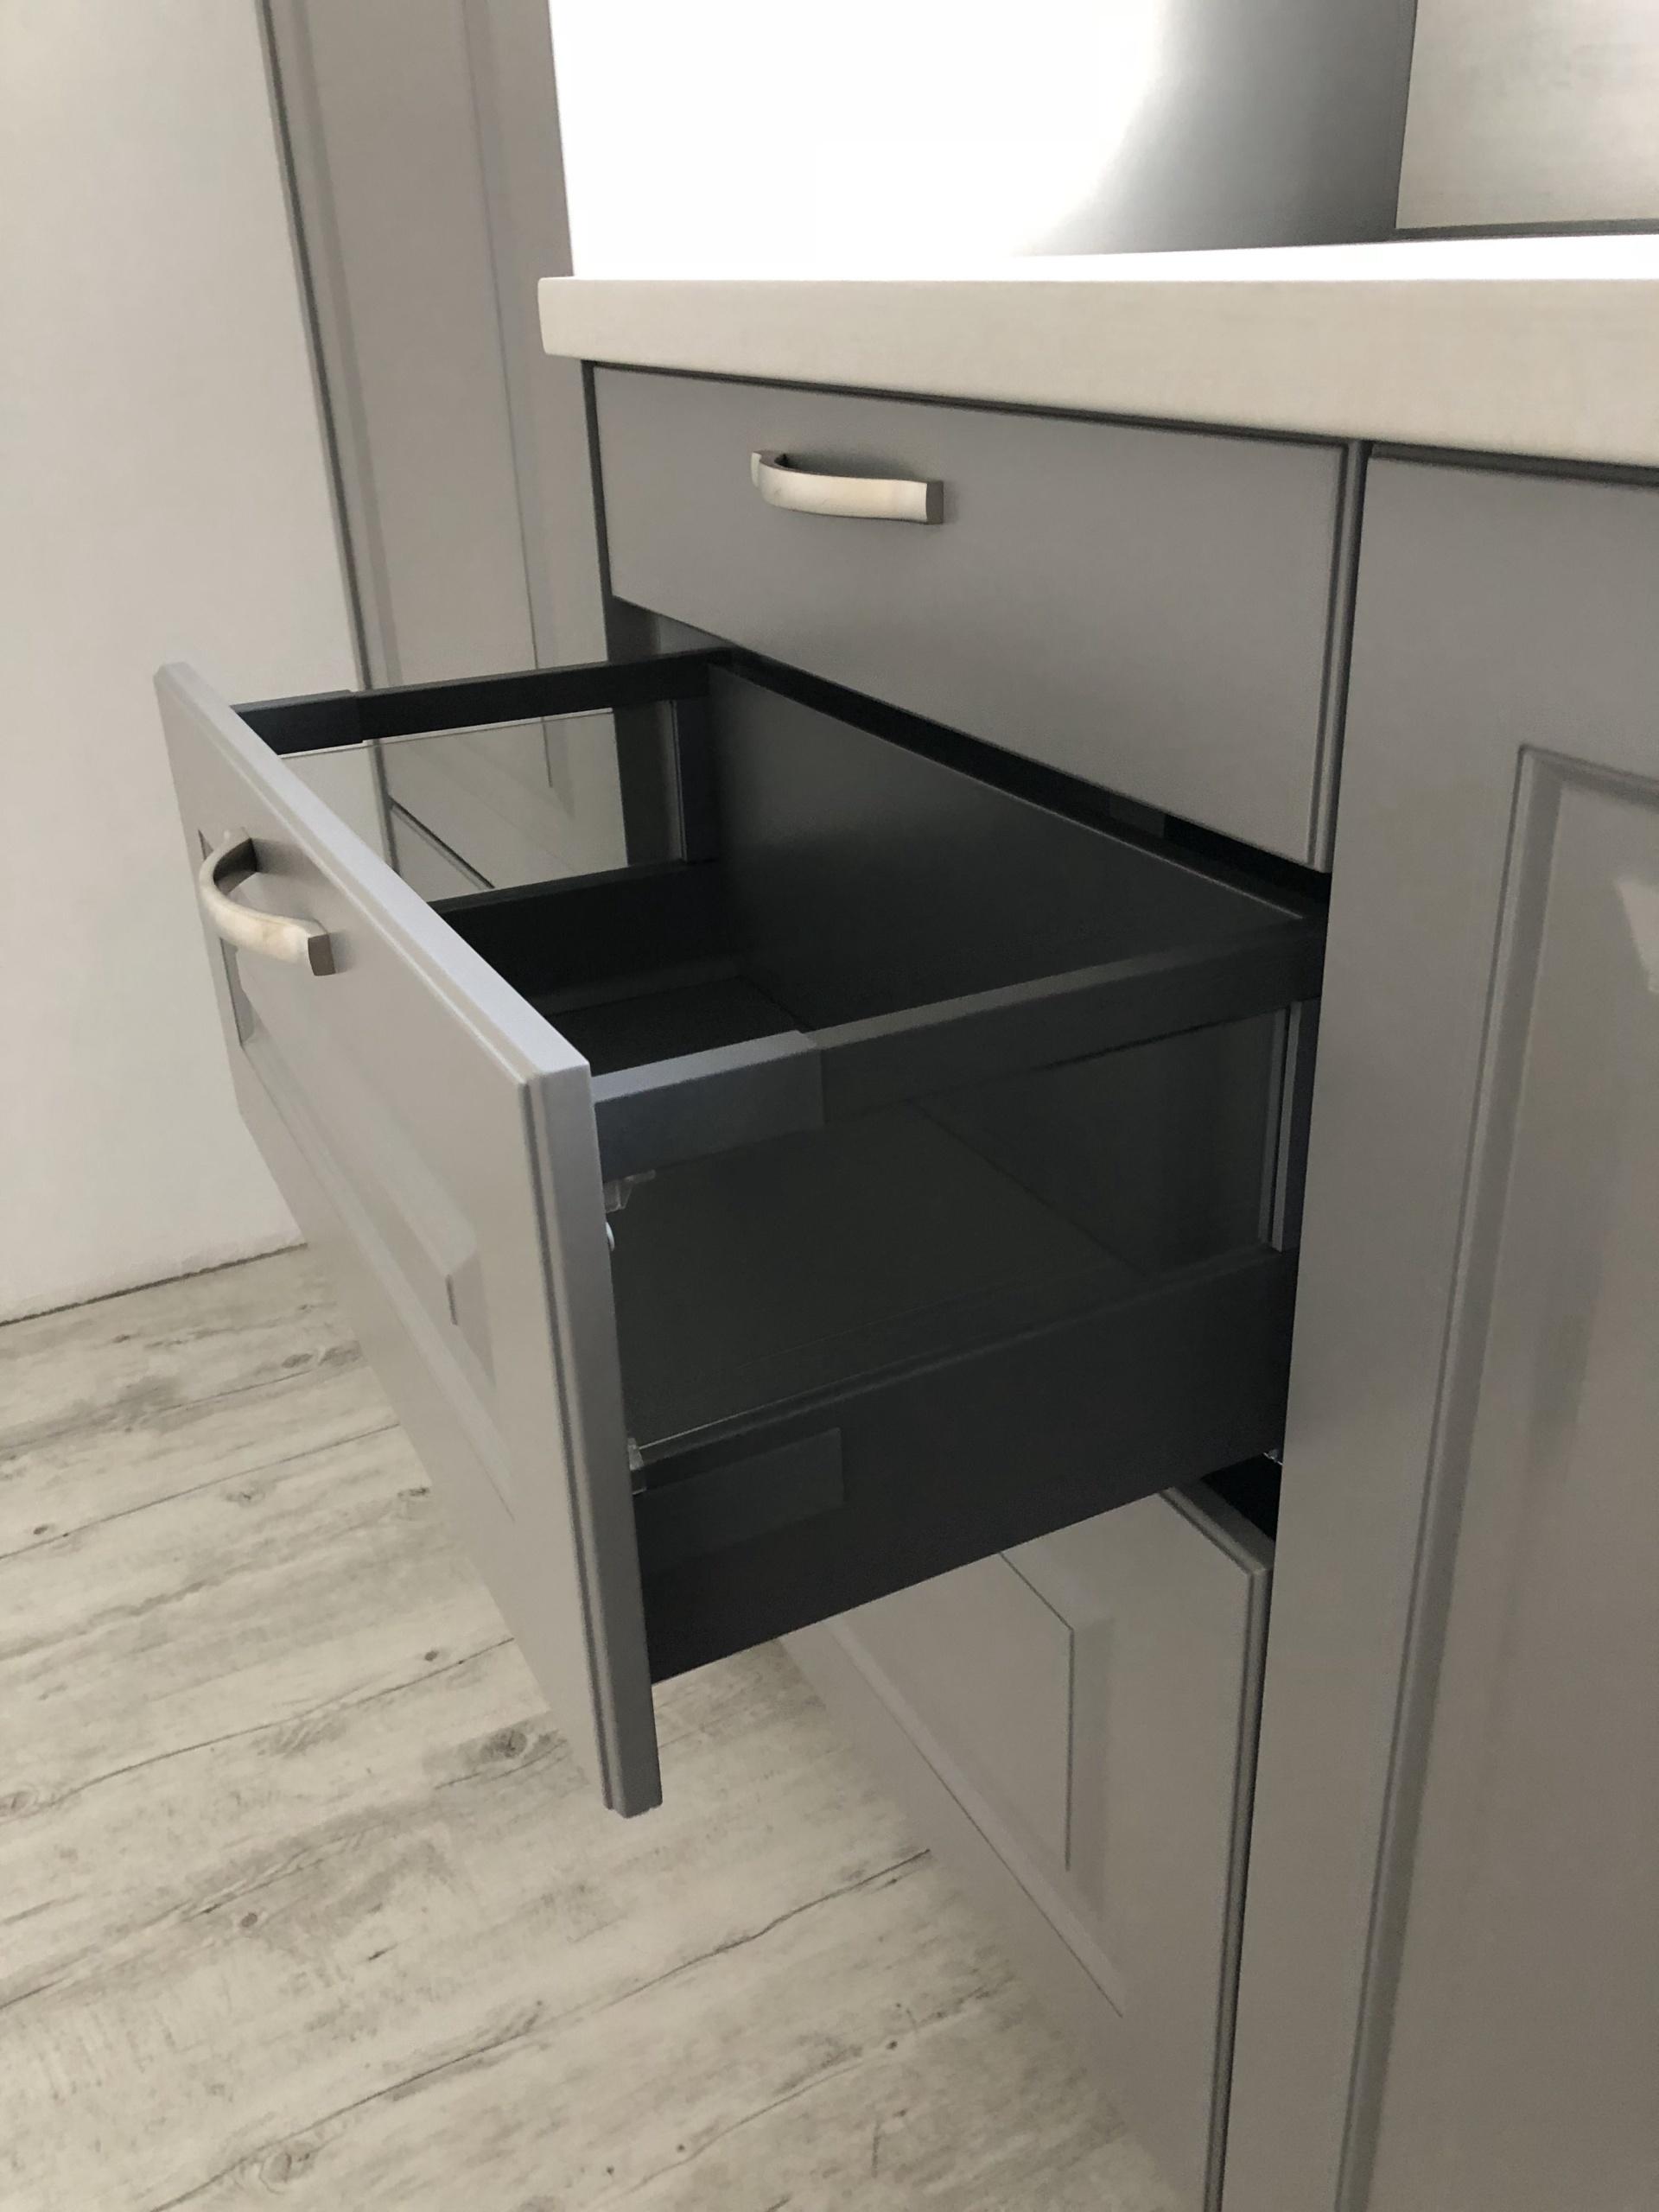 Winkelküche Inox Grau tiefengekürzte Schublade